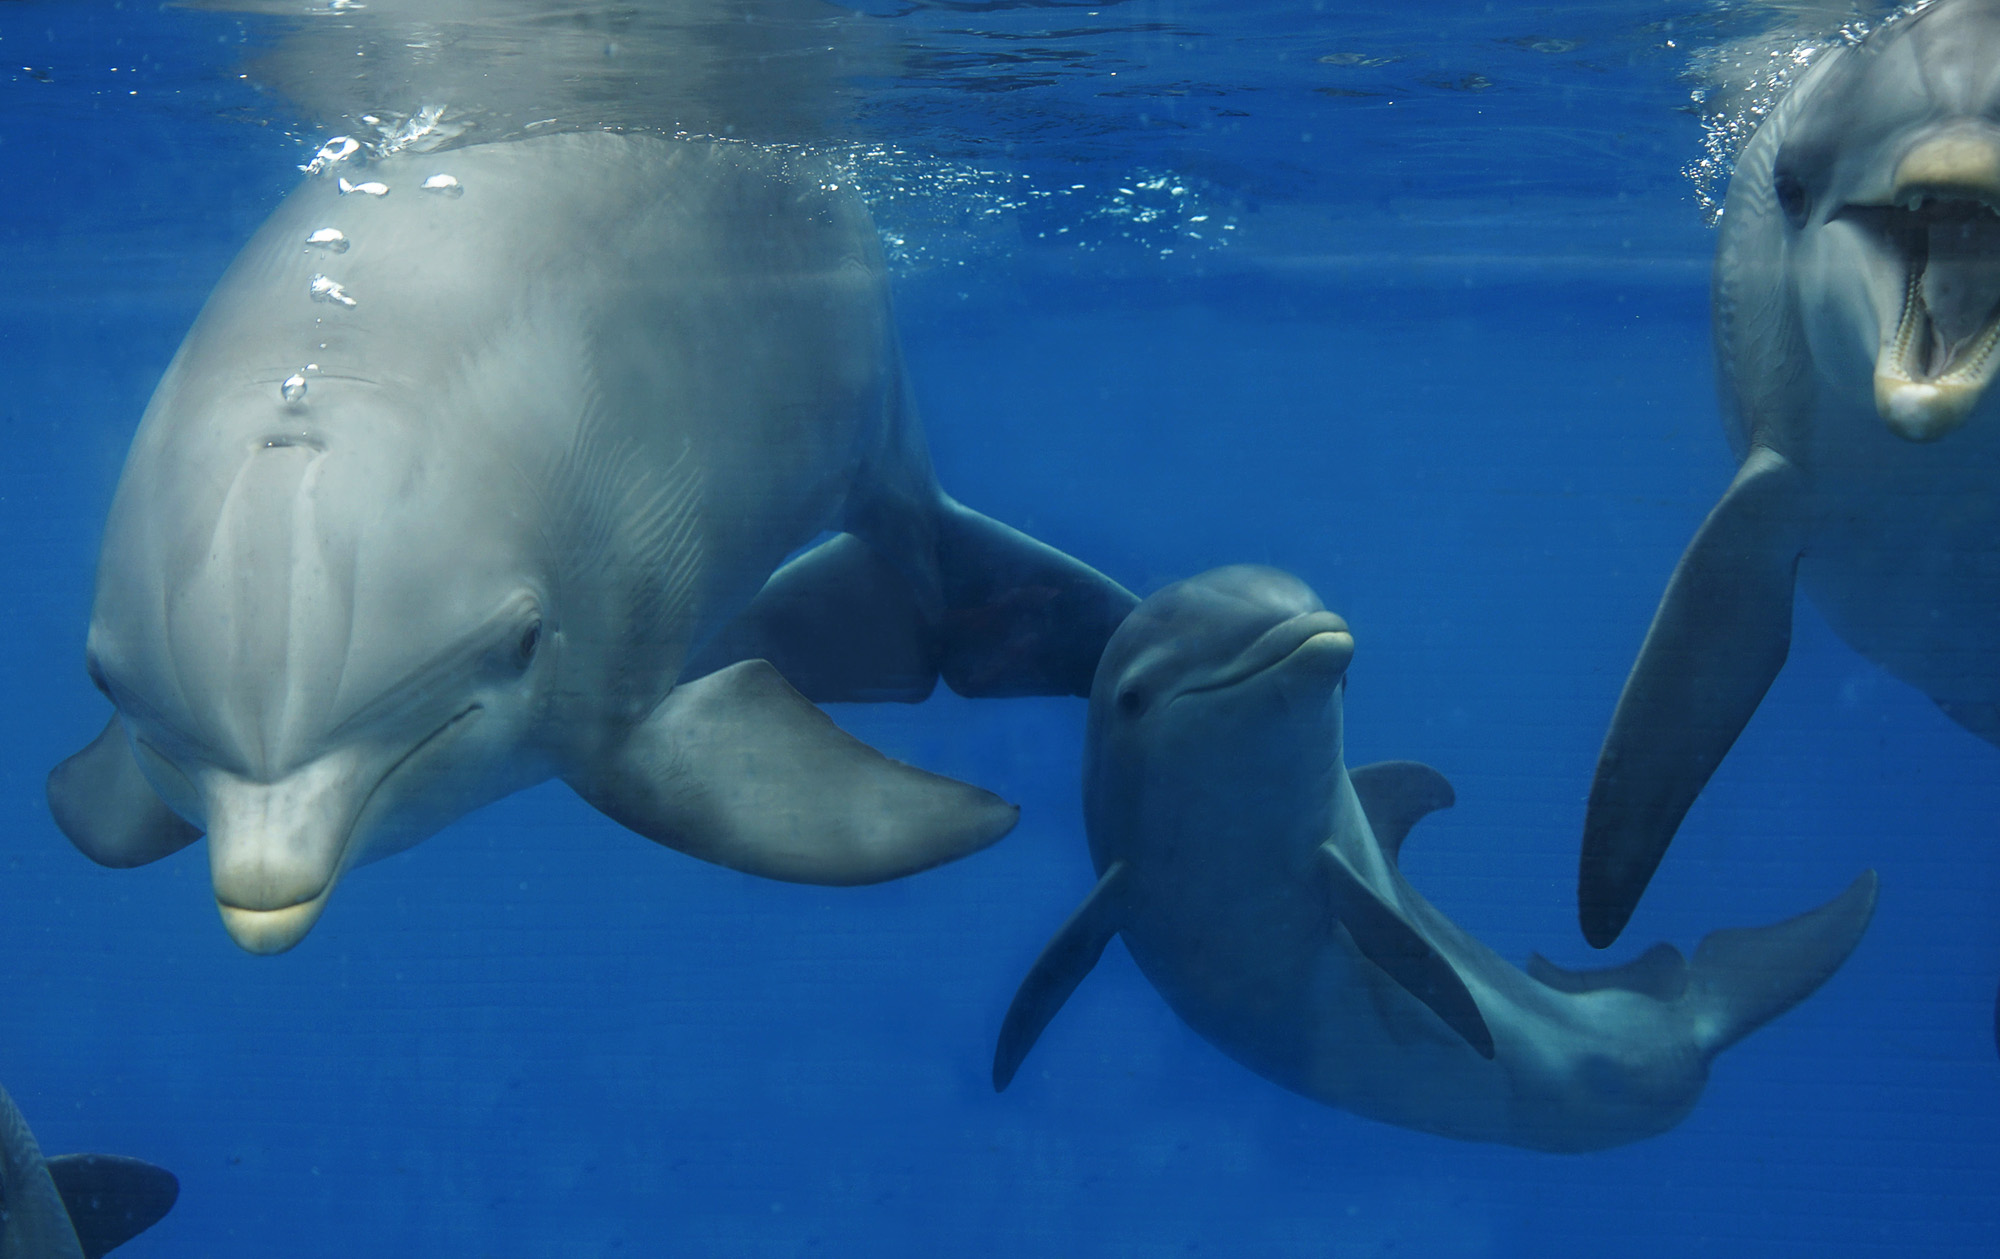 Spanish Aquarium Shows Off Baby Dolphin